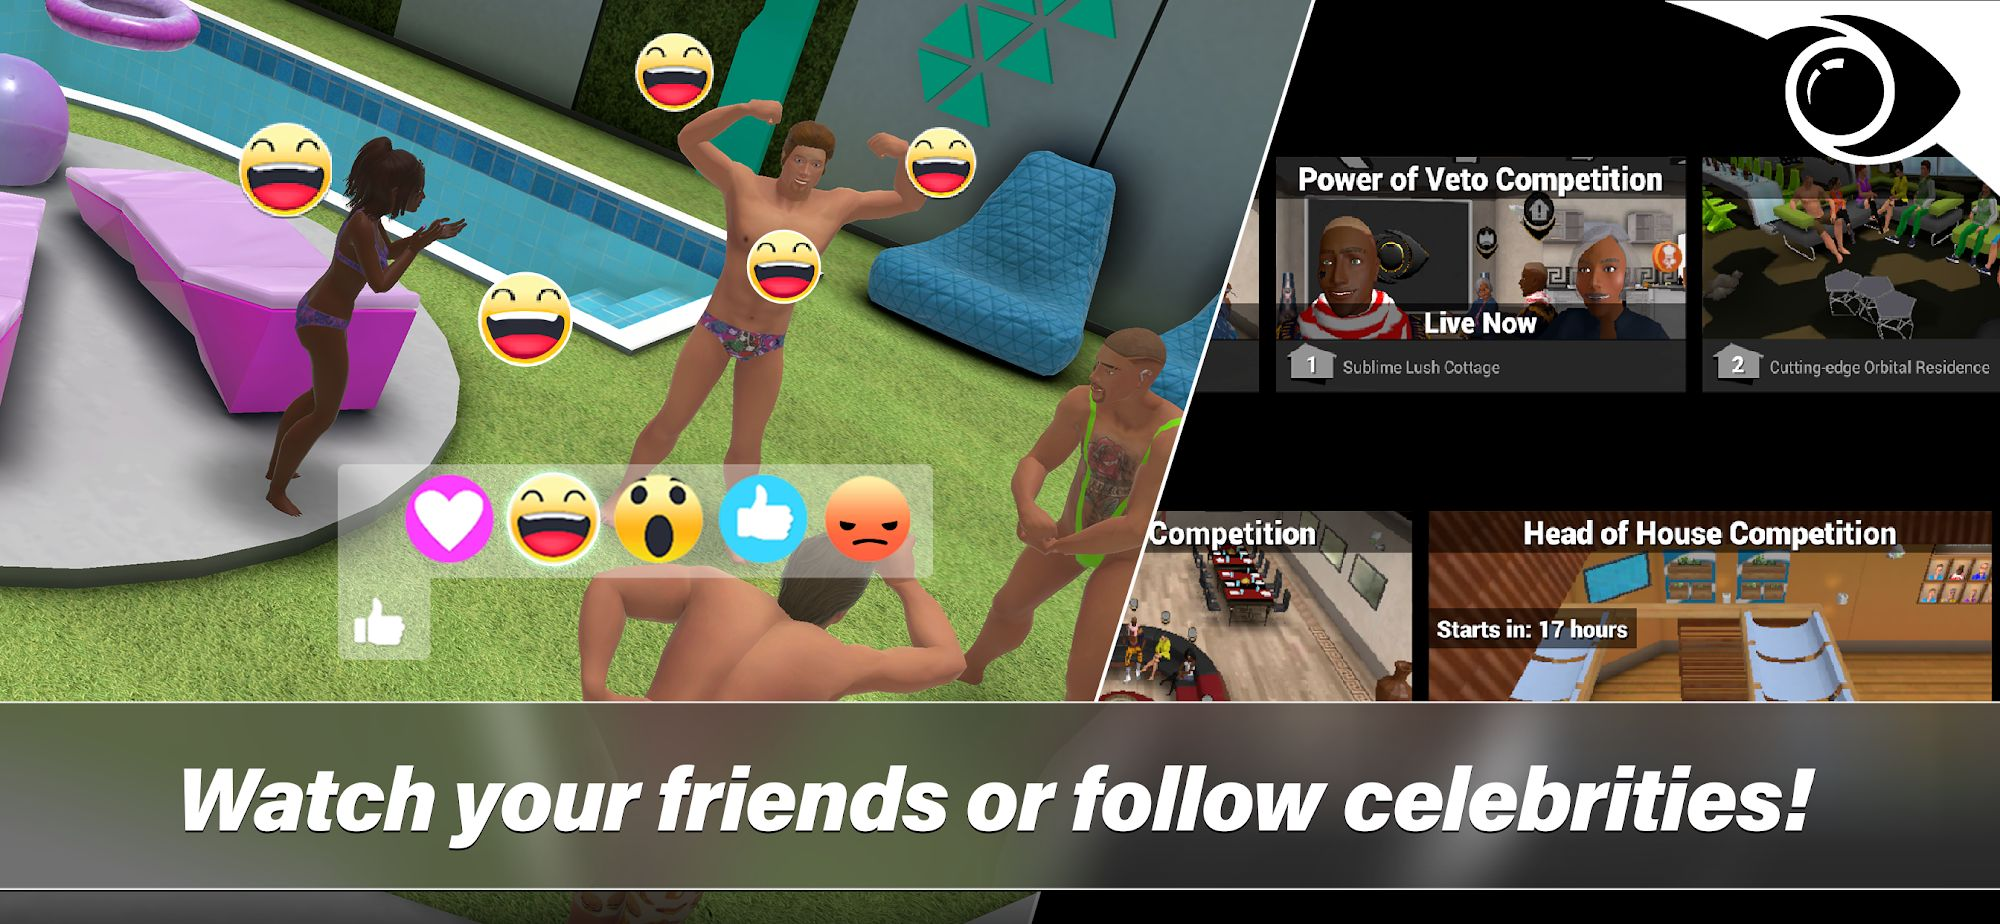 Big Brother: The Game screenshot 1